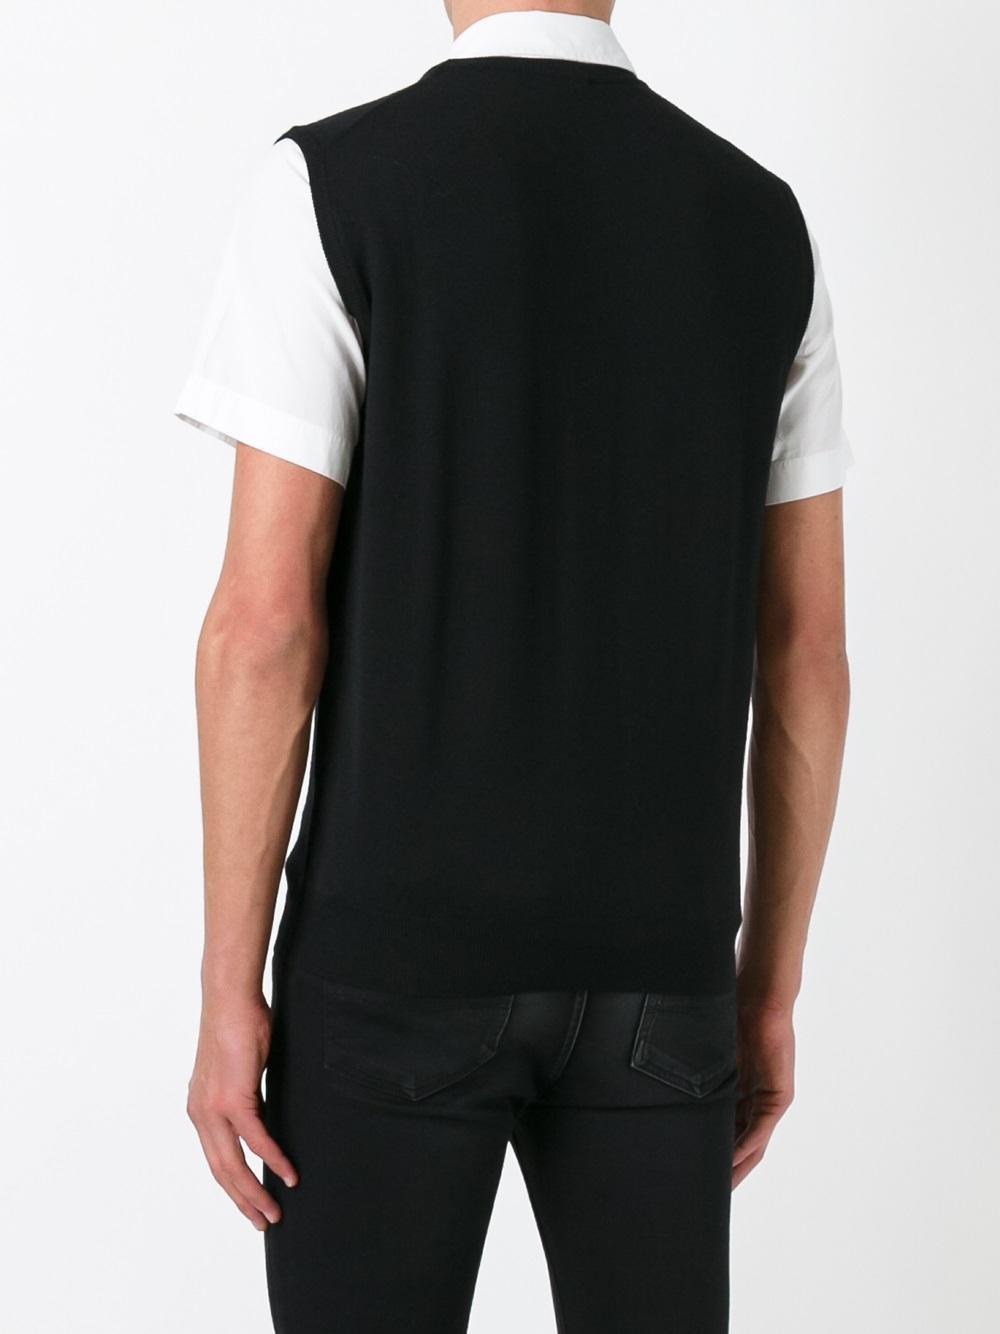 Lacoste Sleeveless Sweater